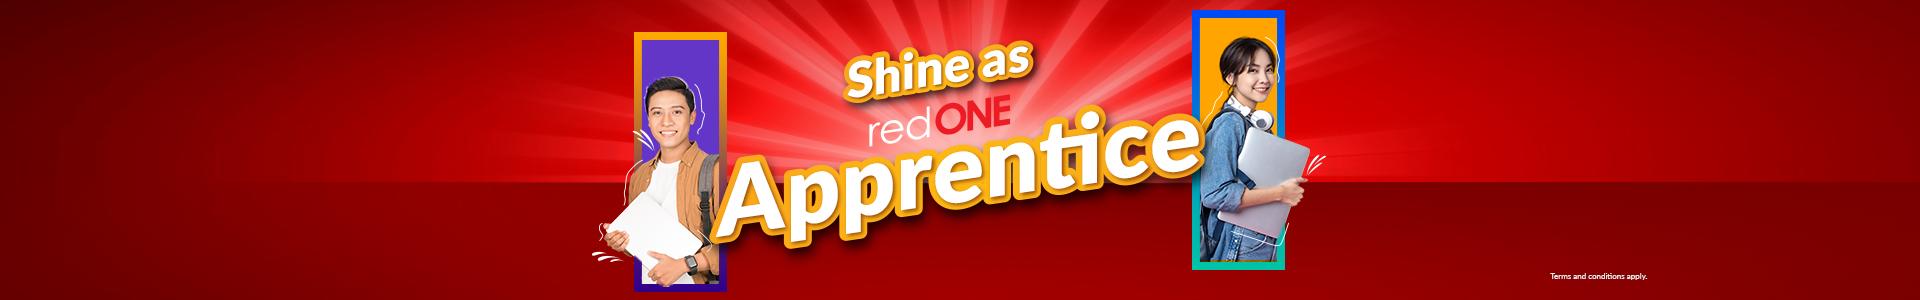 redONE Apprentice